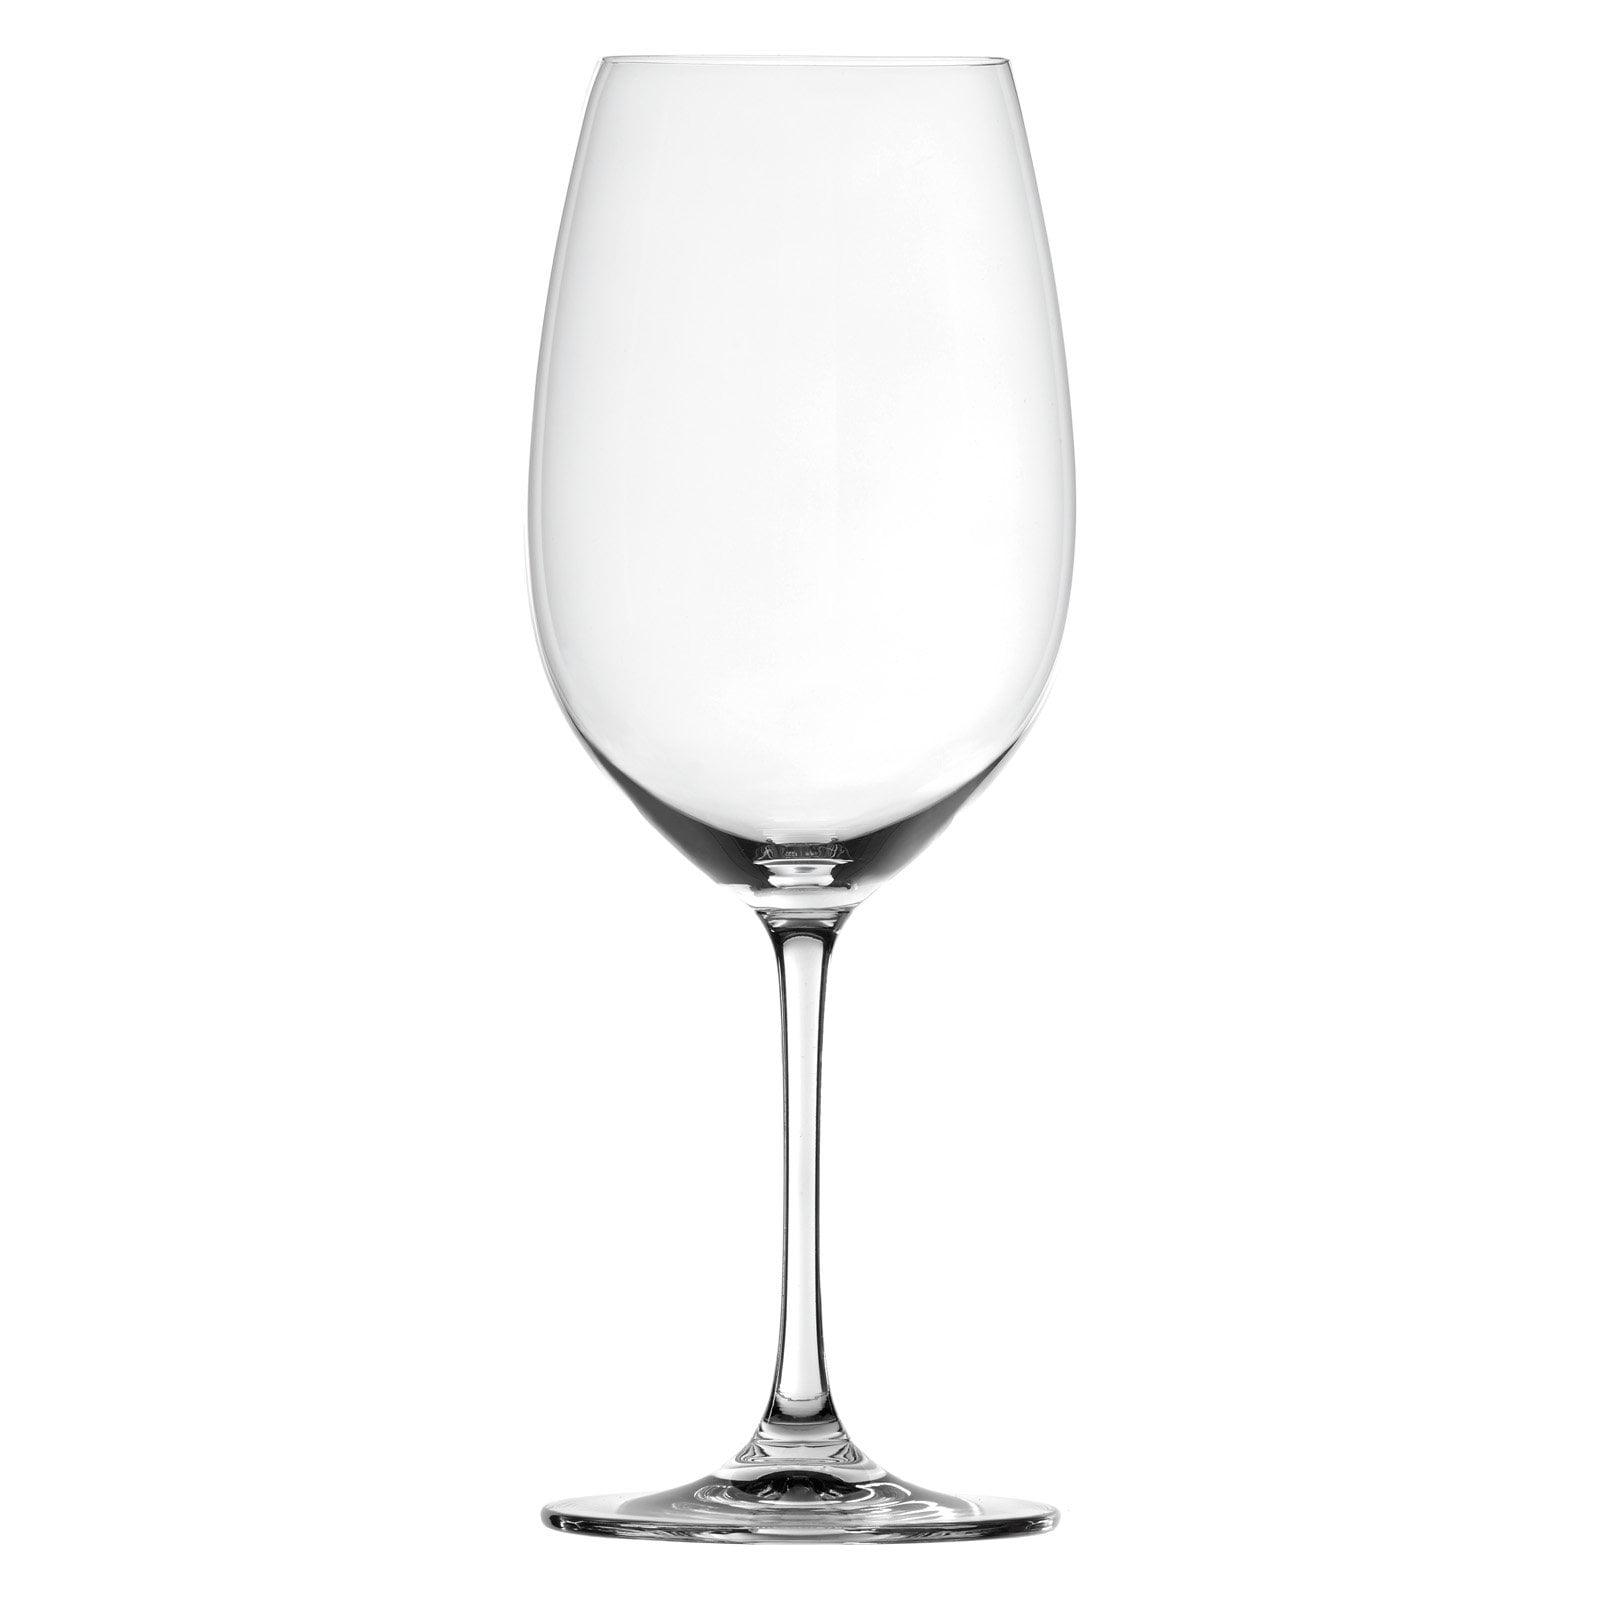 Spiegelau Salute Bordeaux Glass Set of 4 by Overstock